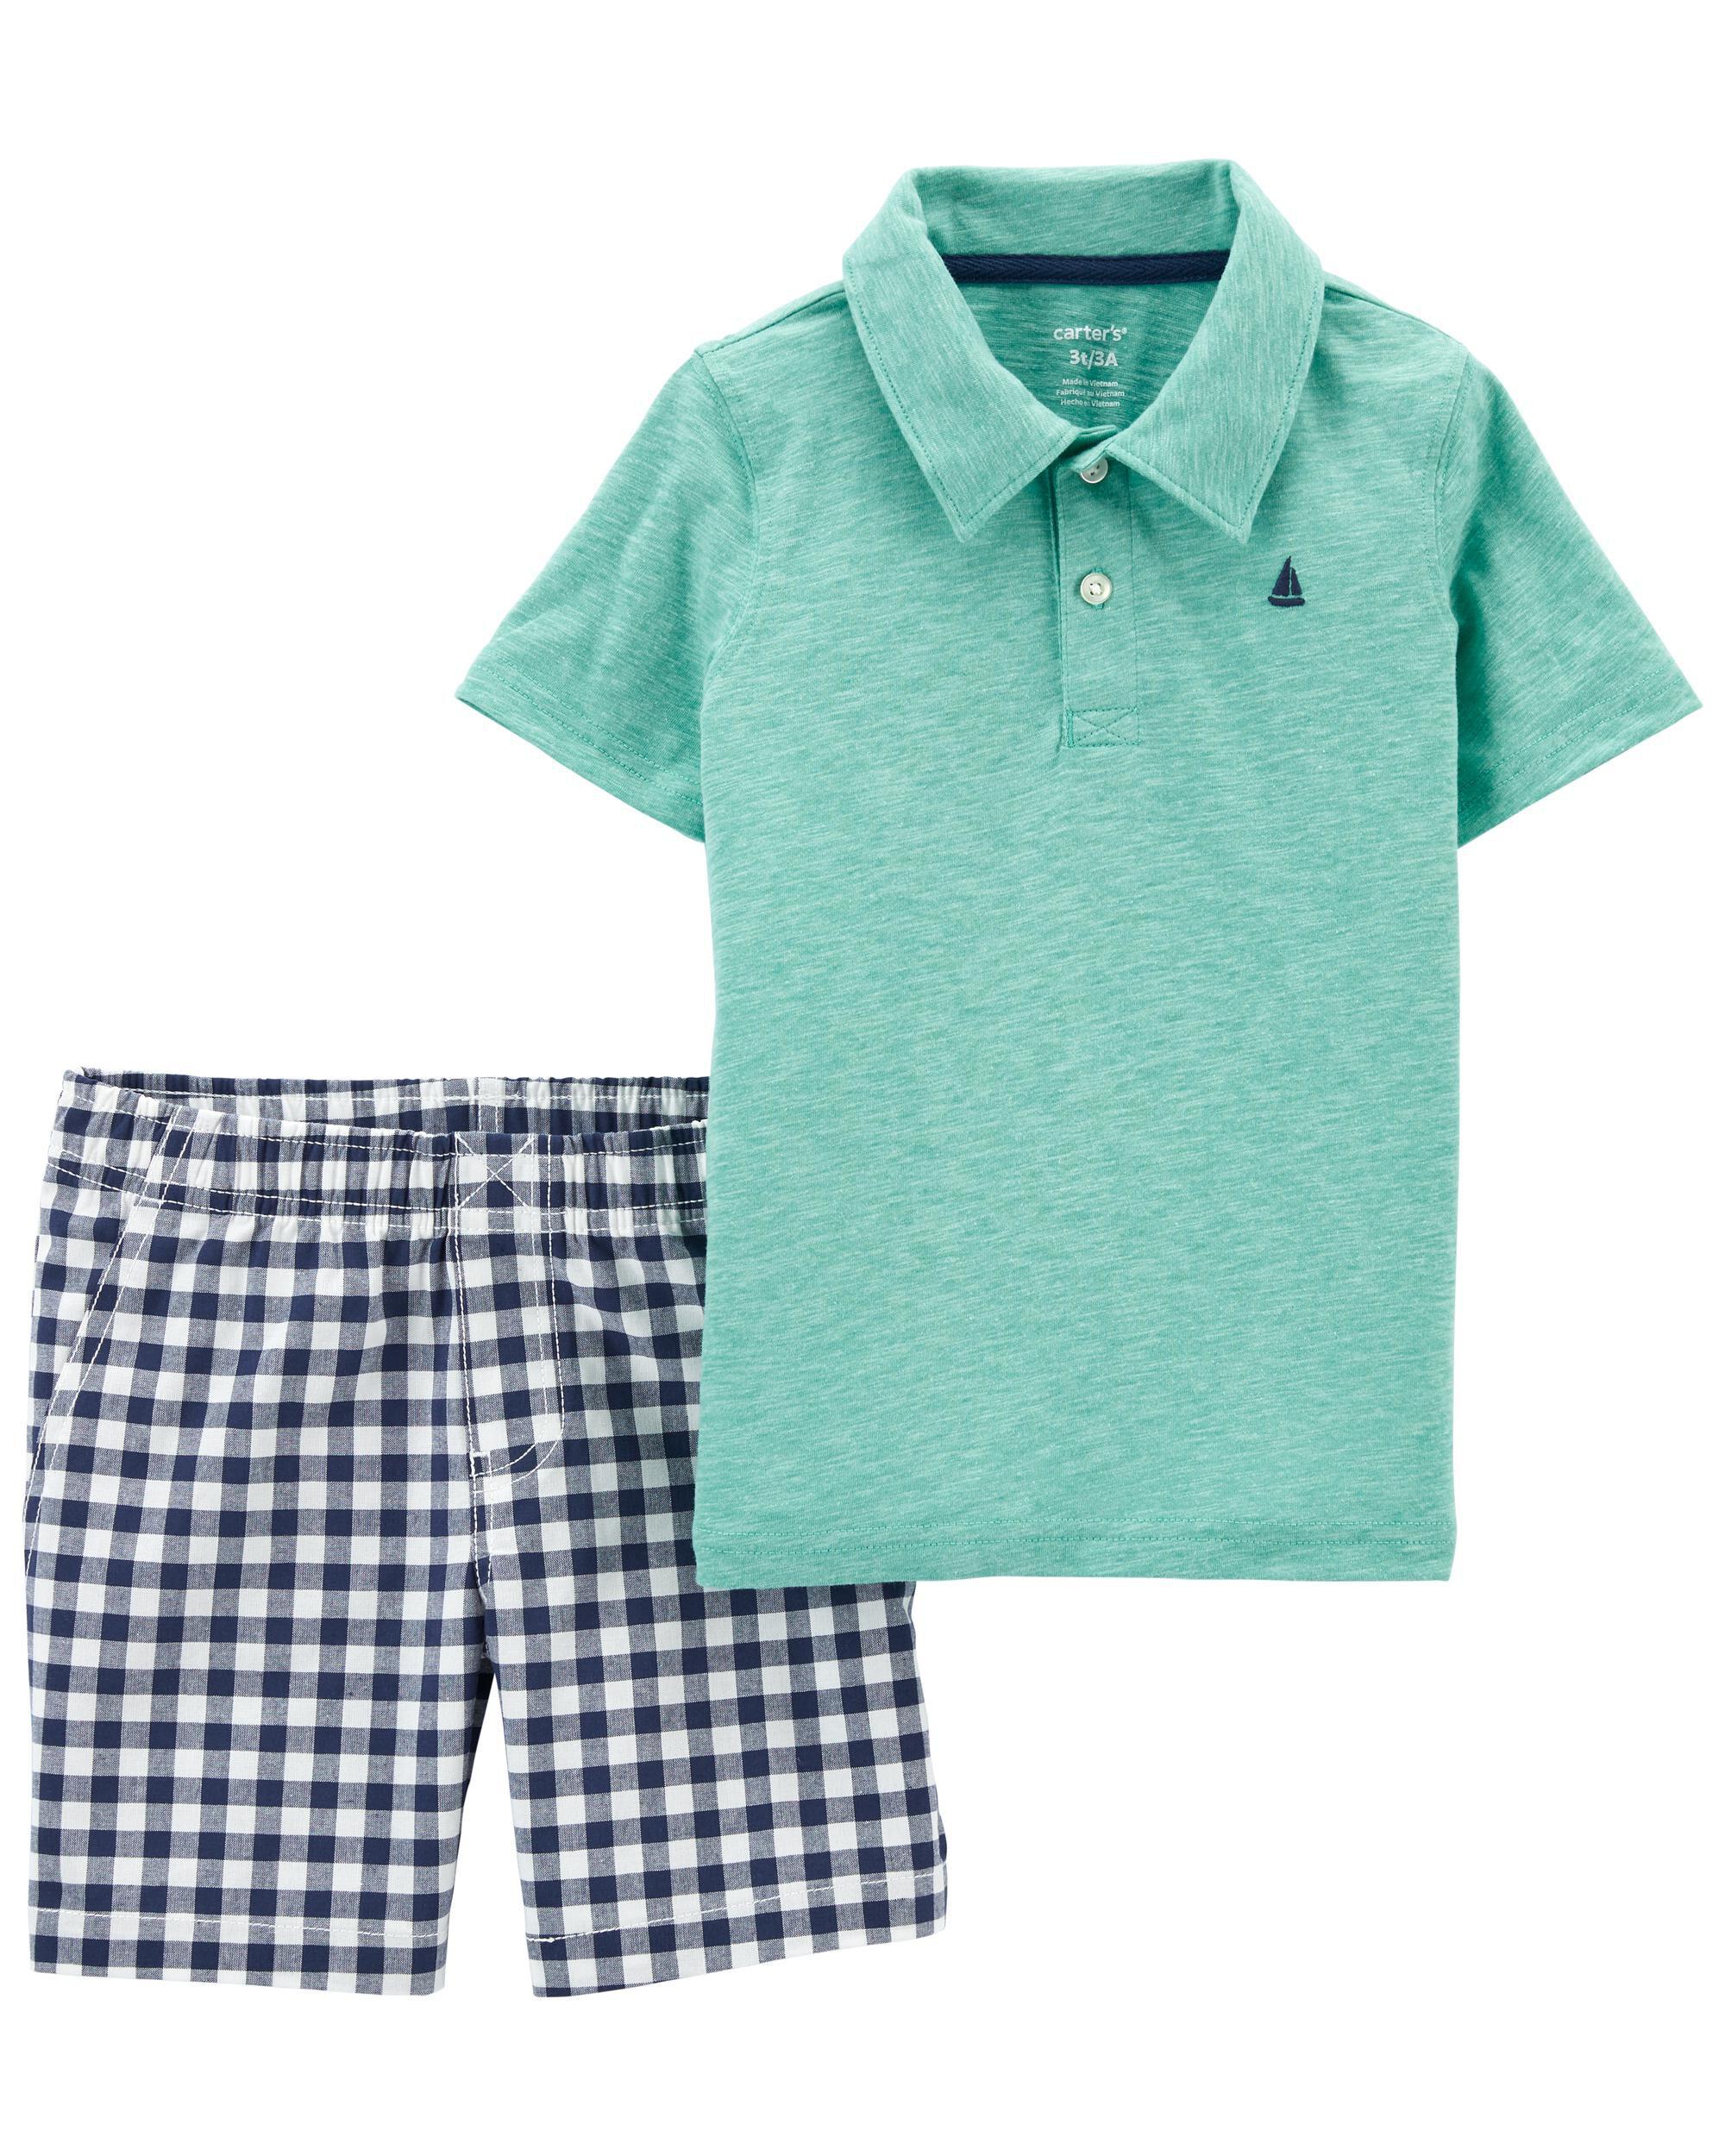 Carters 2-Piece Jersey Polo & Short Set